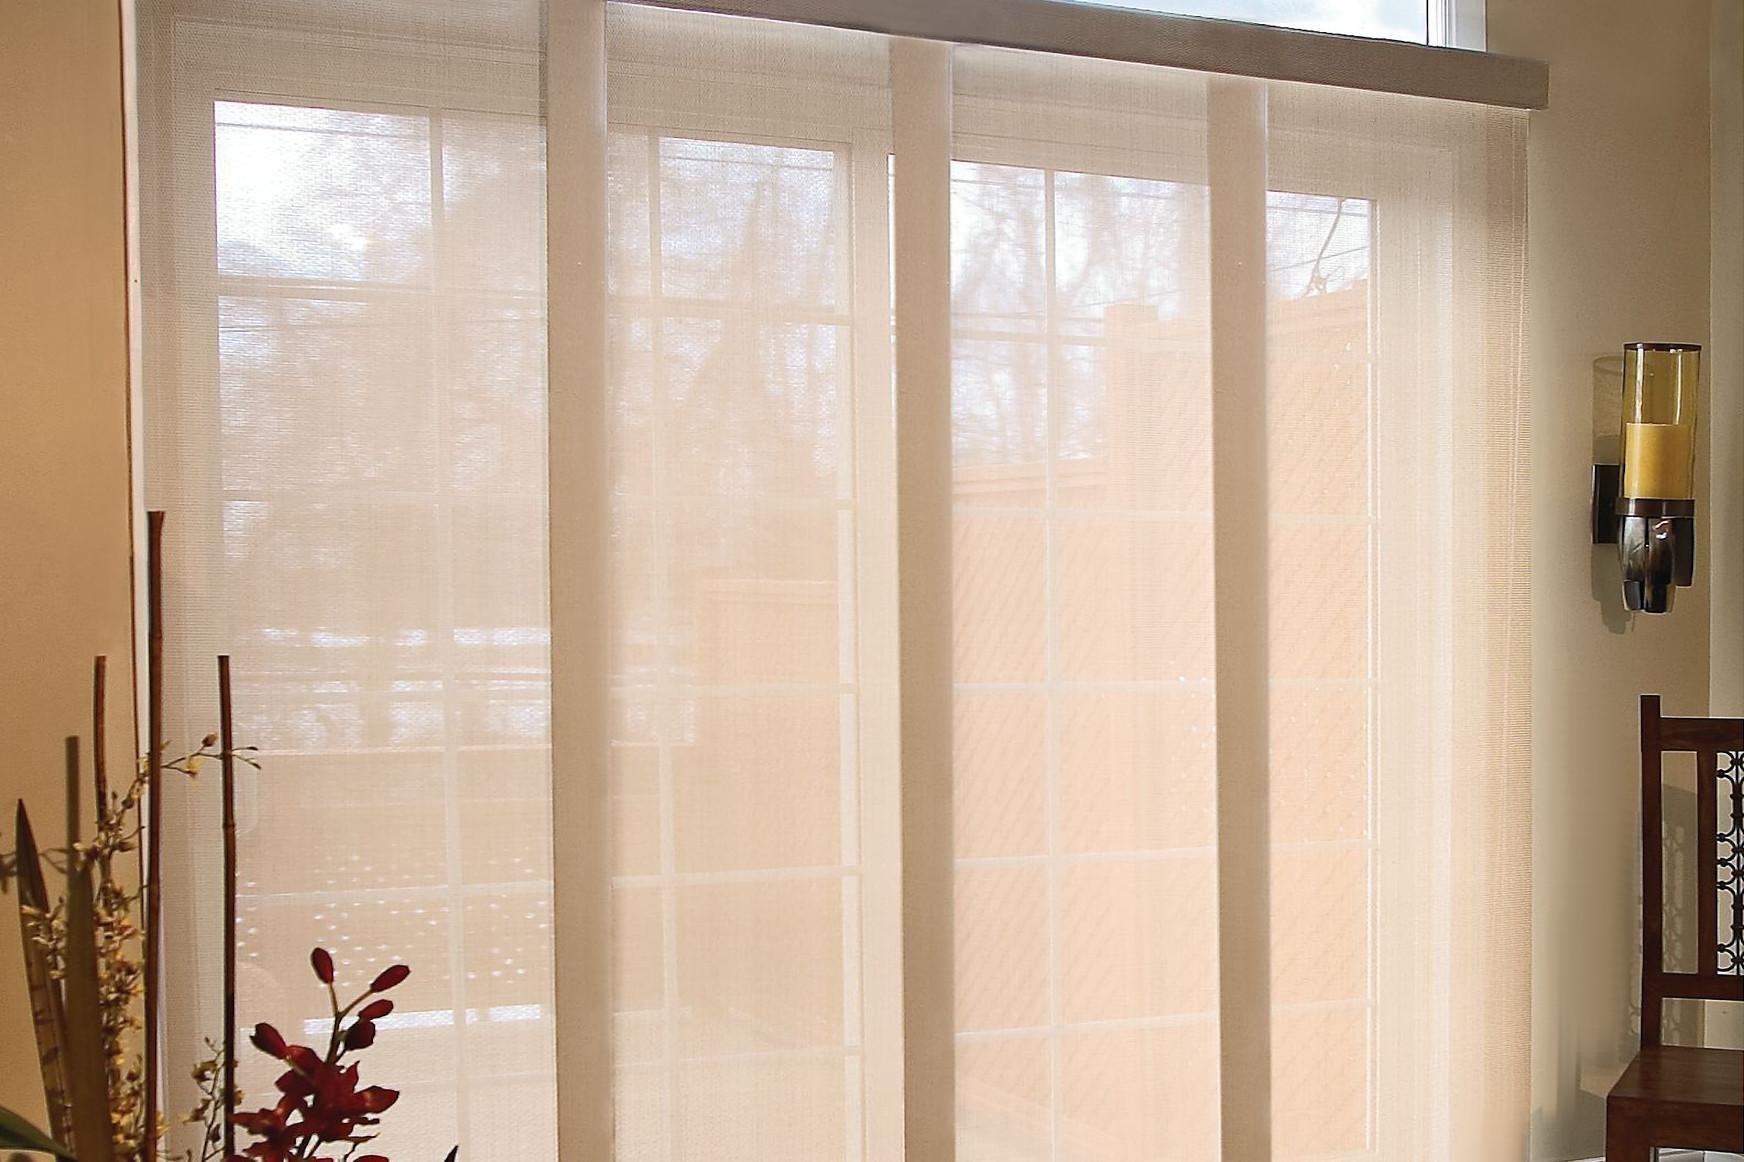 Tan solar shade panel tracks cover a large sliding glass door